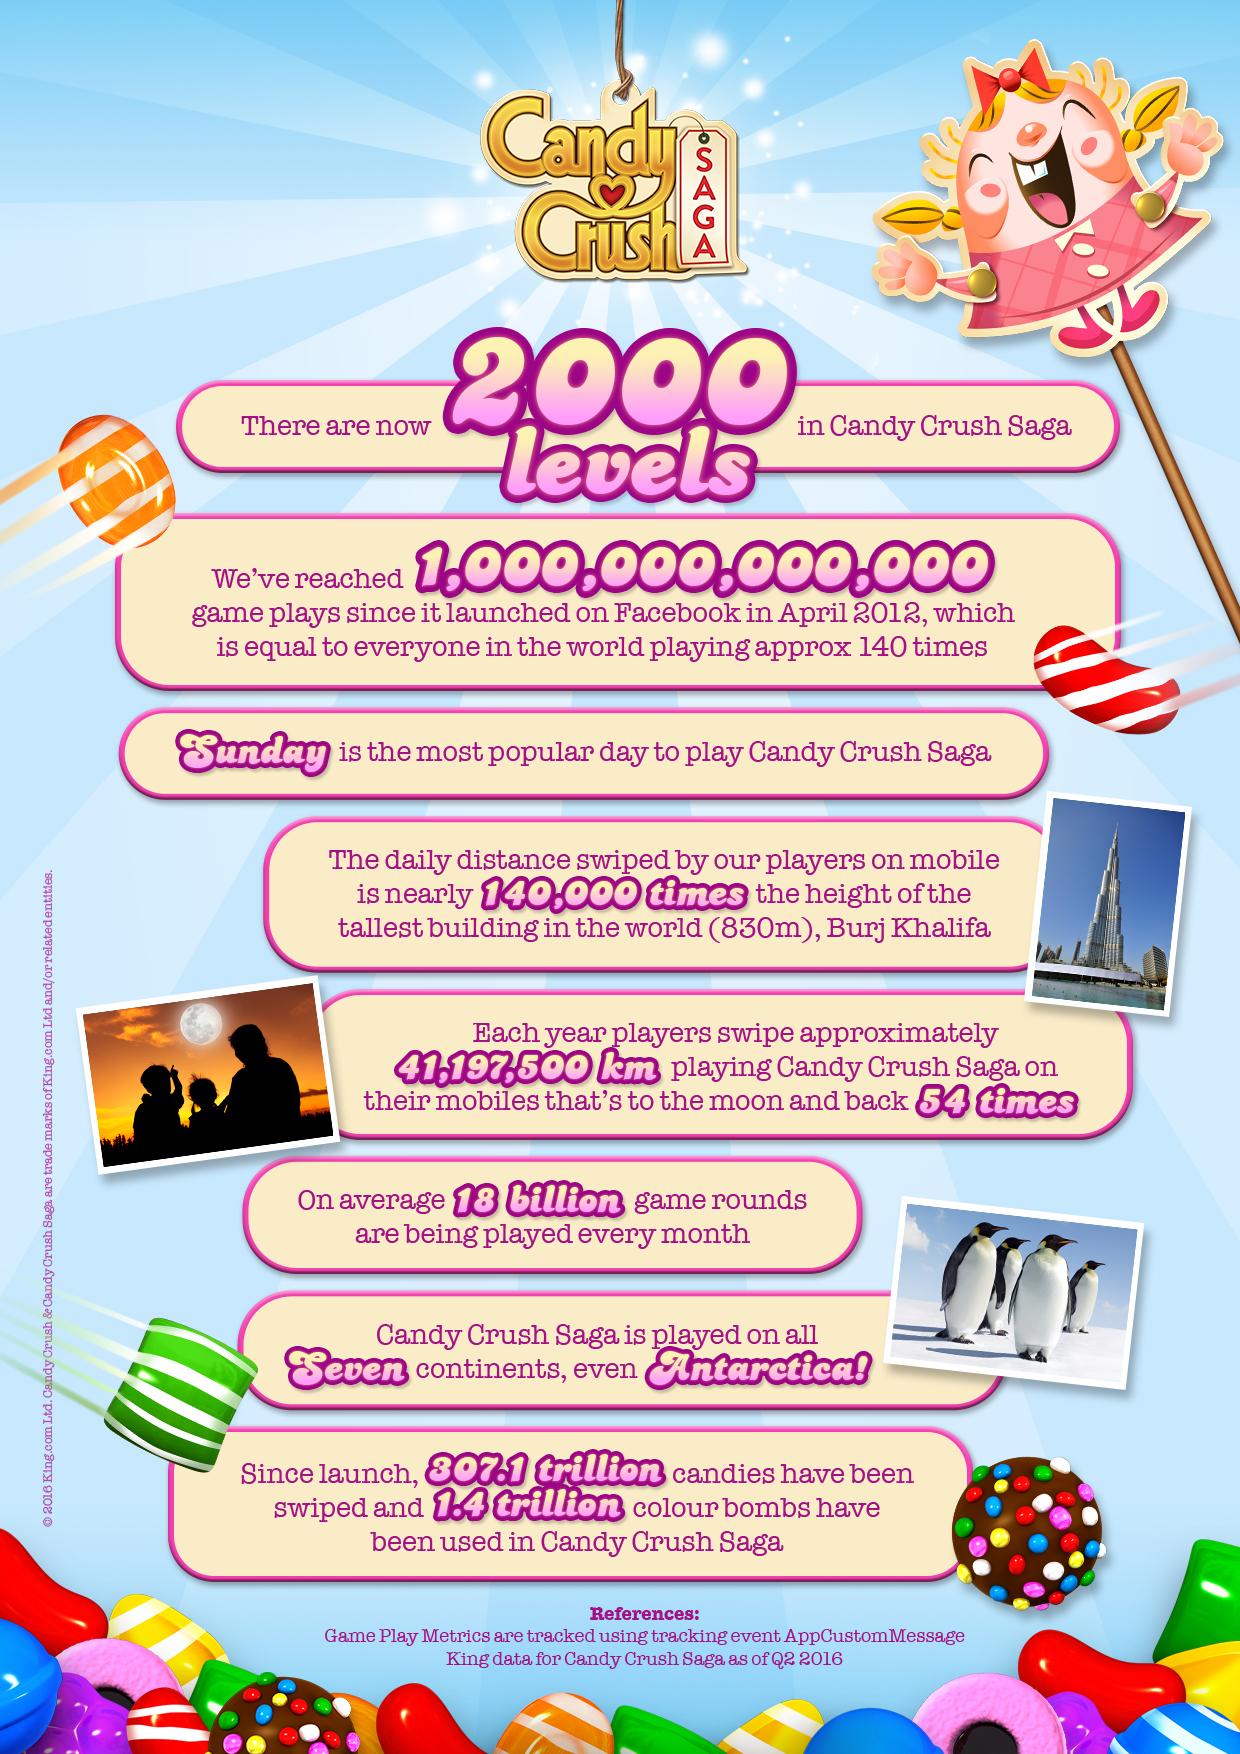 candy crush saga celebrates one trillion games played with level